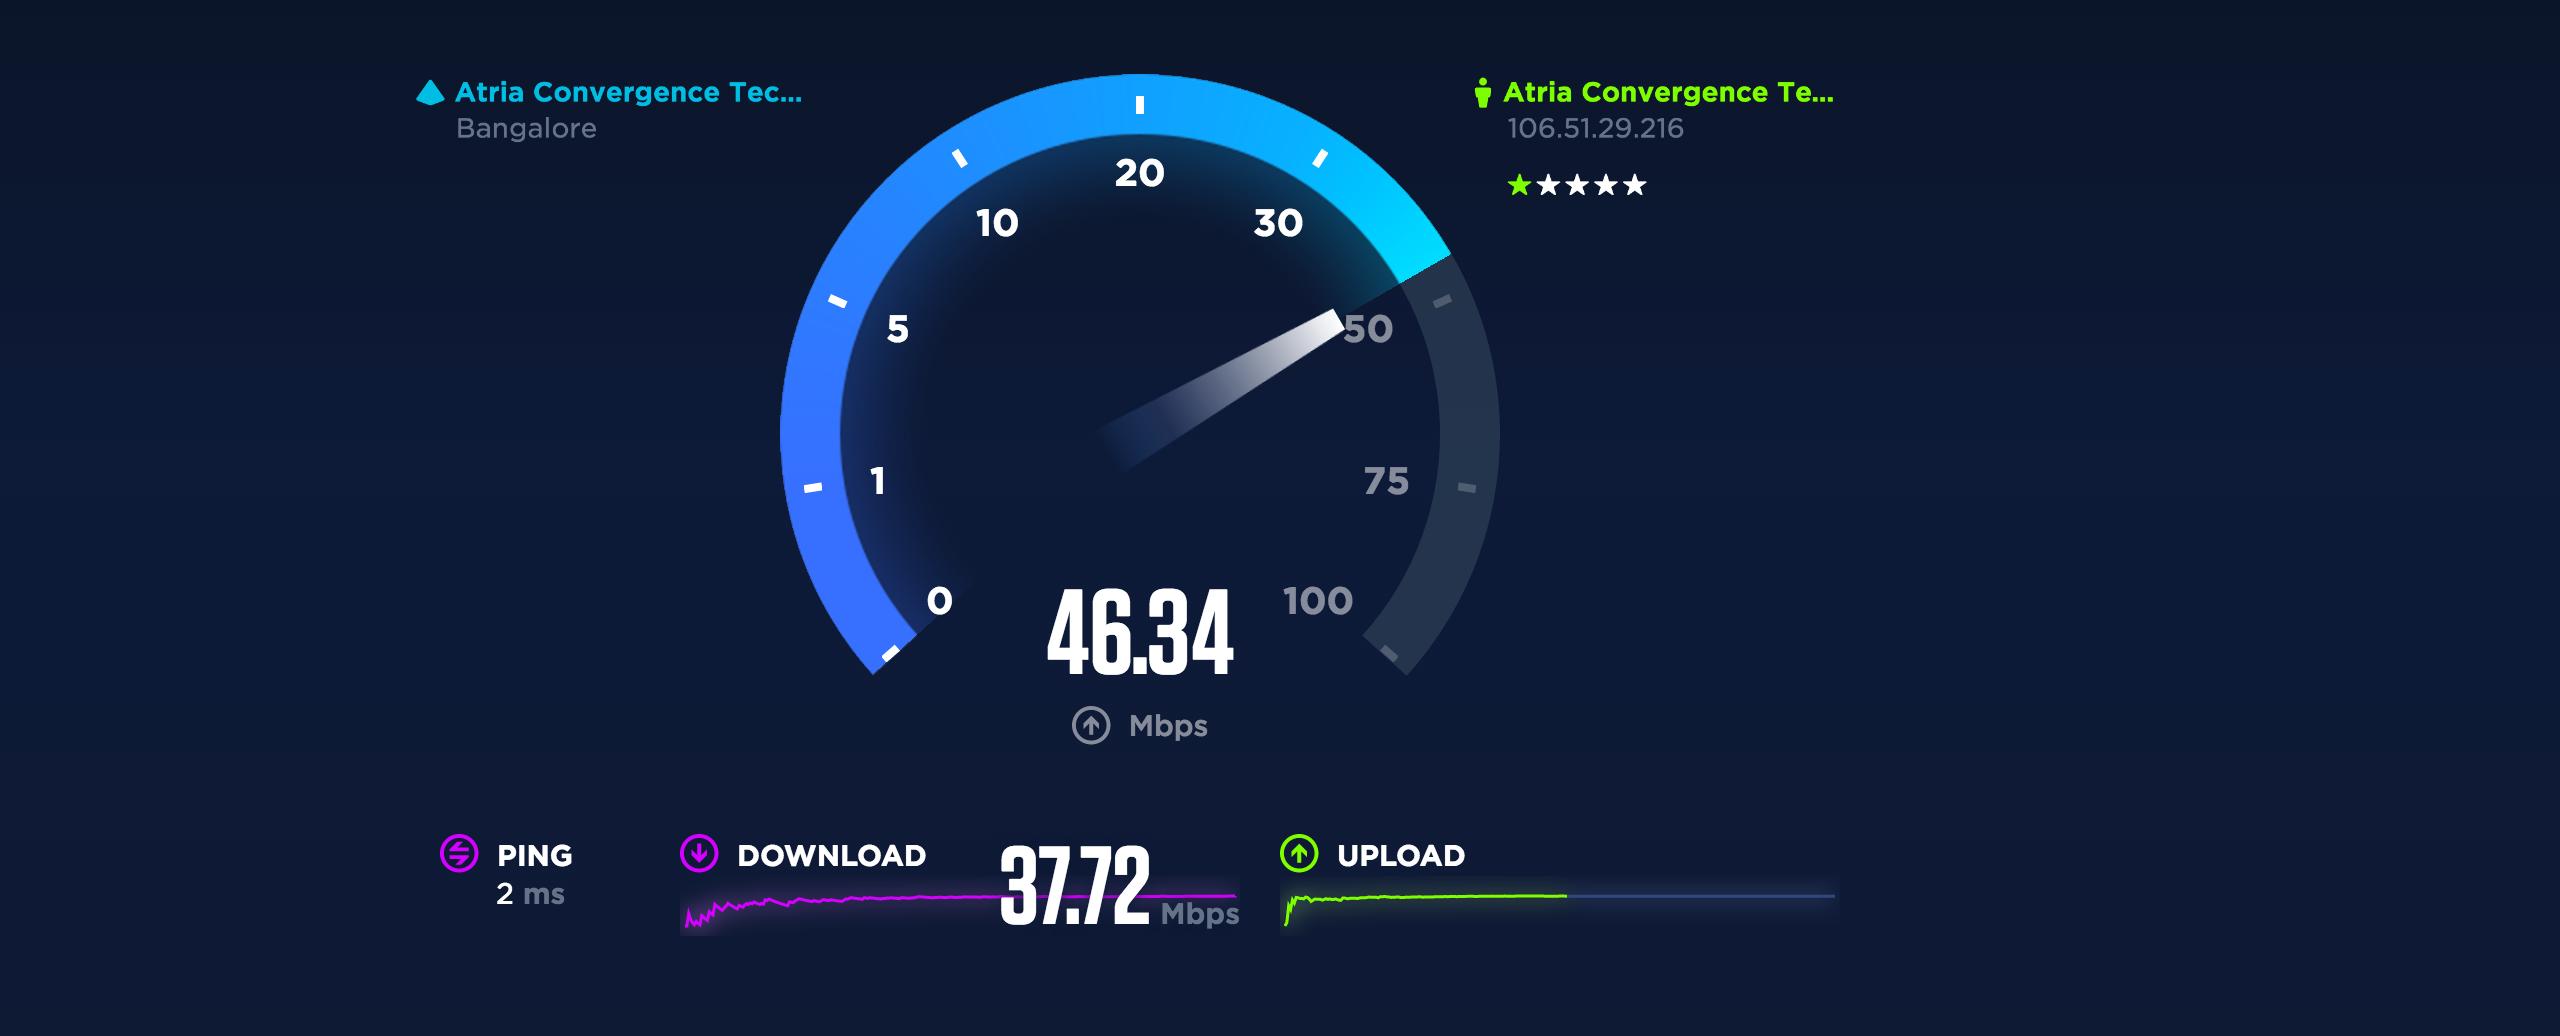 Тест скорости интернета